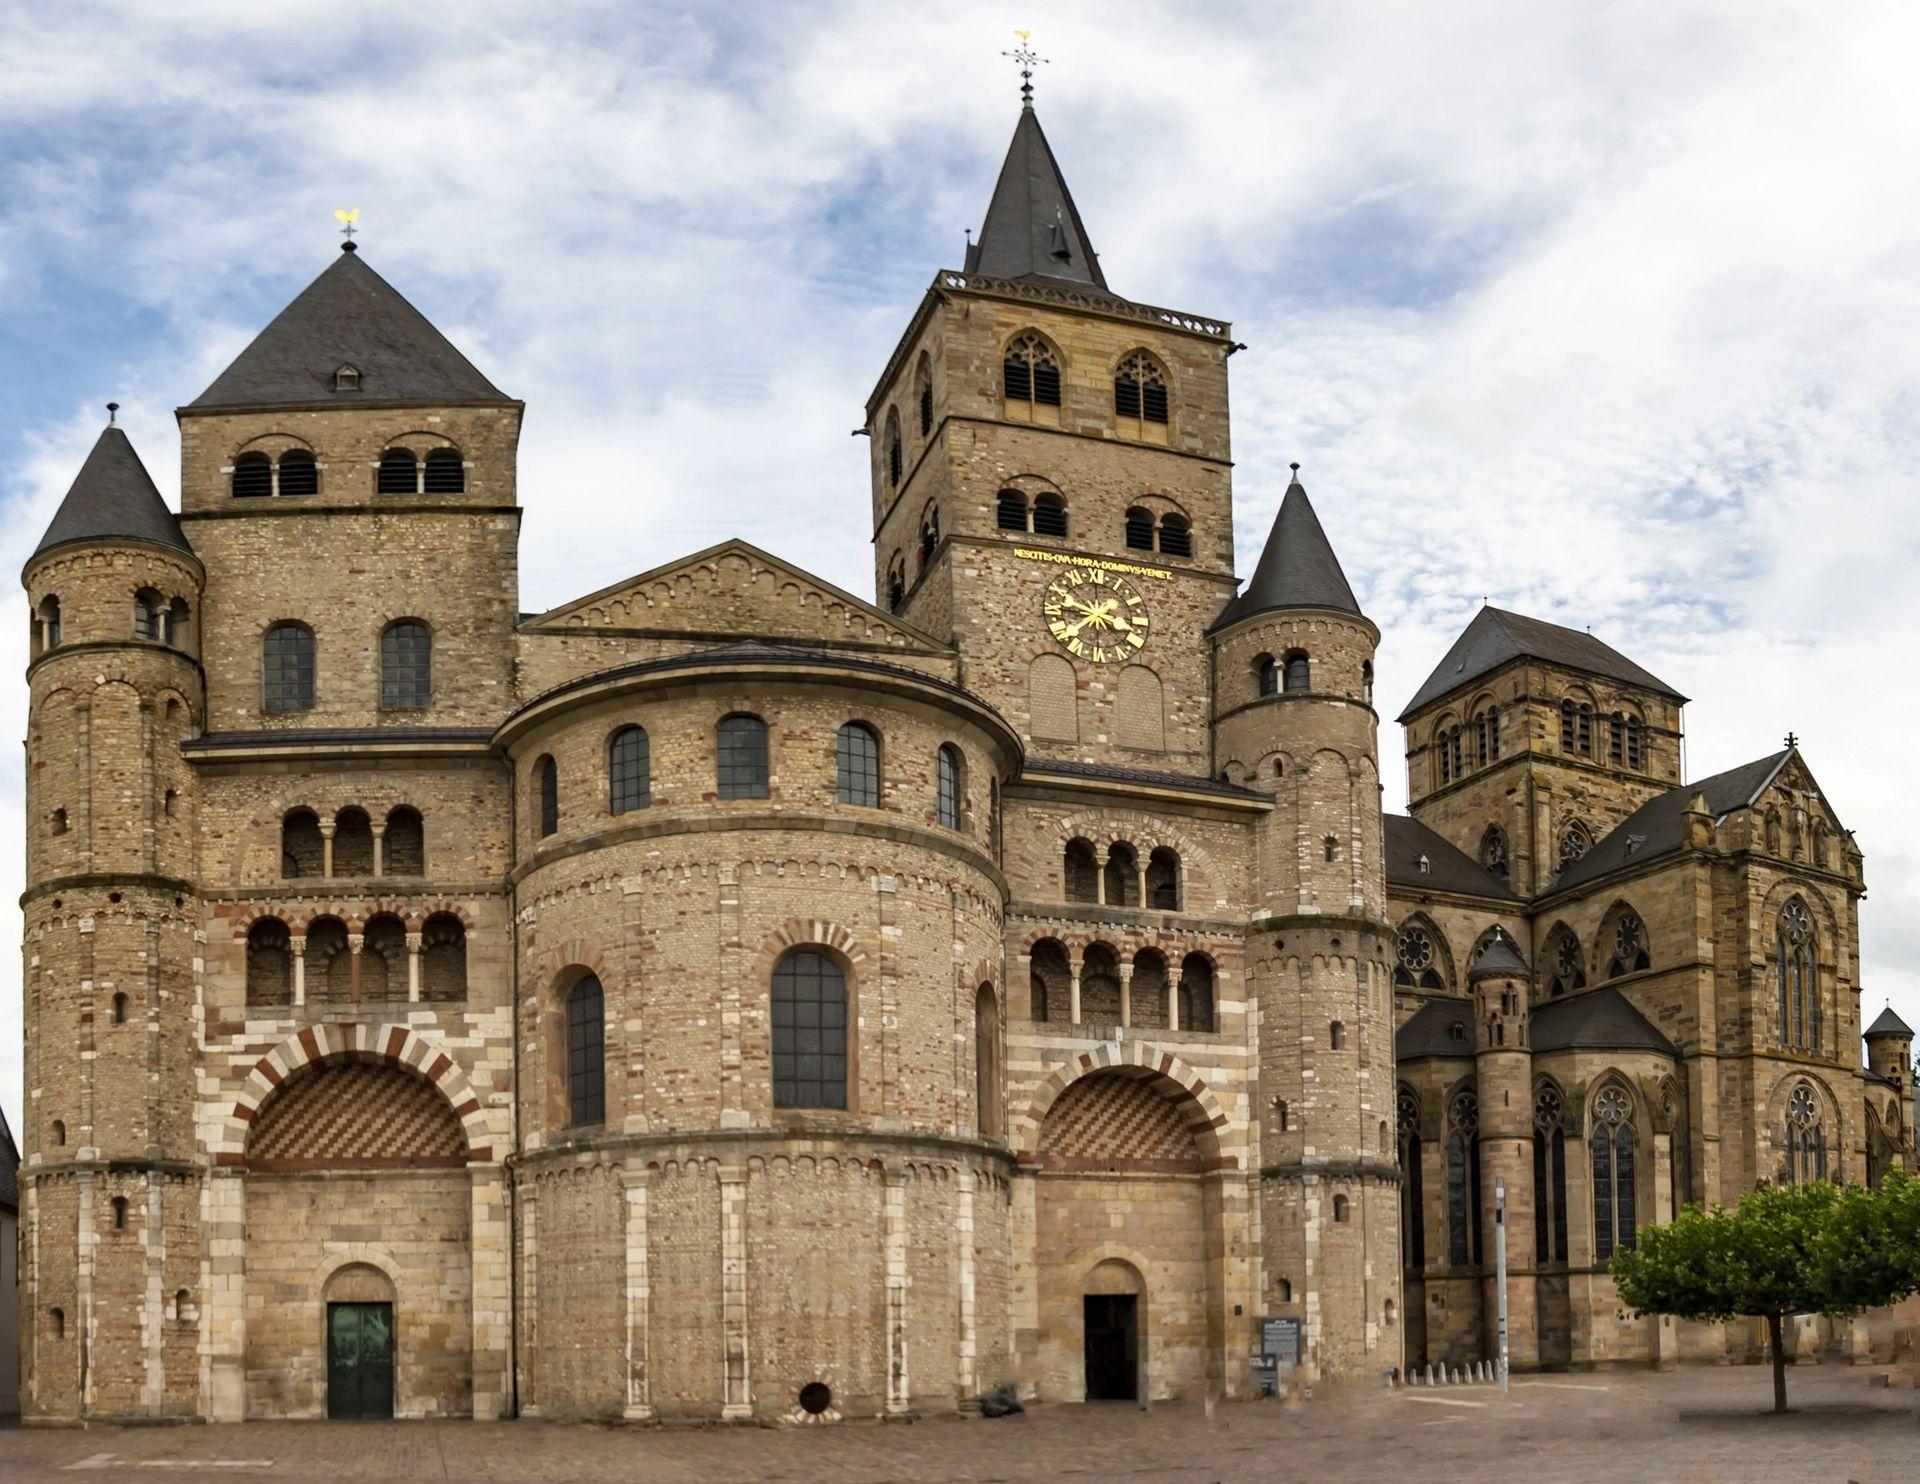 Anticimex Kammerjäger in Trier